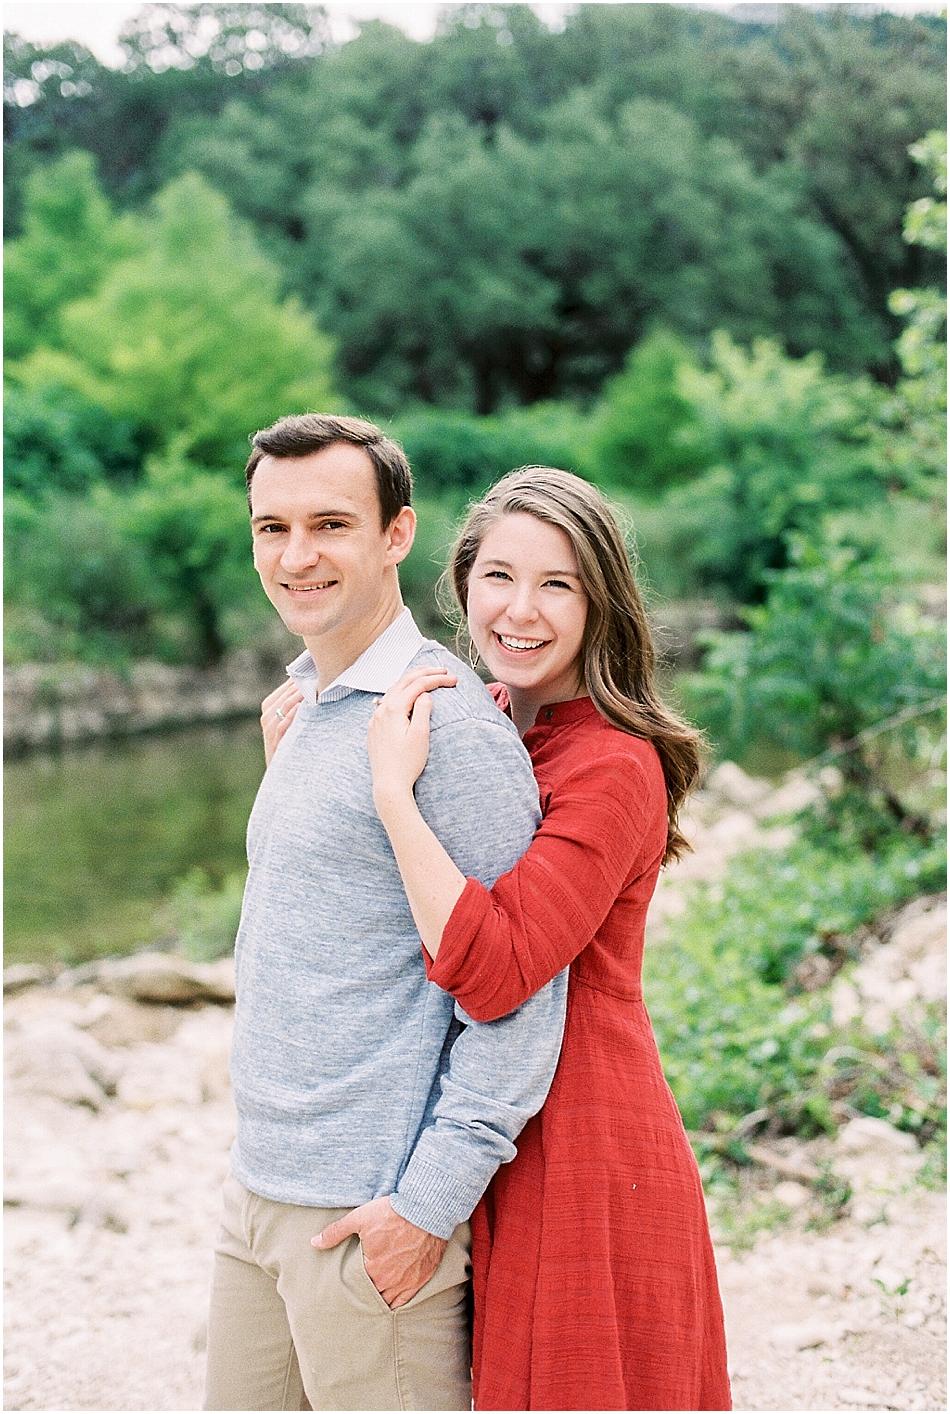 Laura + Nick | Engagement | Fine Art Film | Austin Texas | Emilie Anne Photography-34.jpg